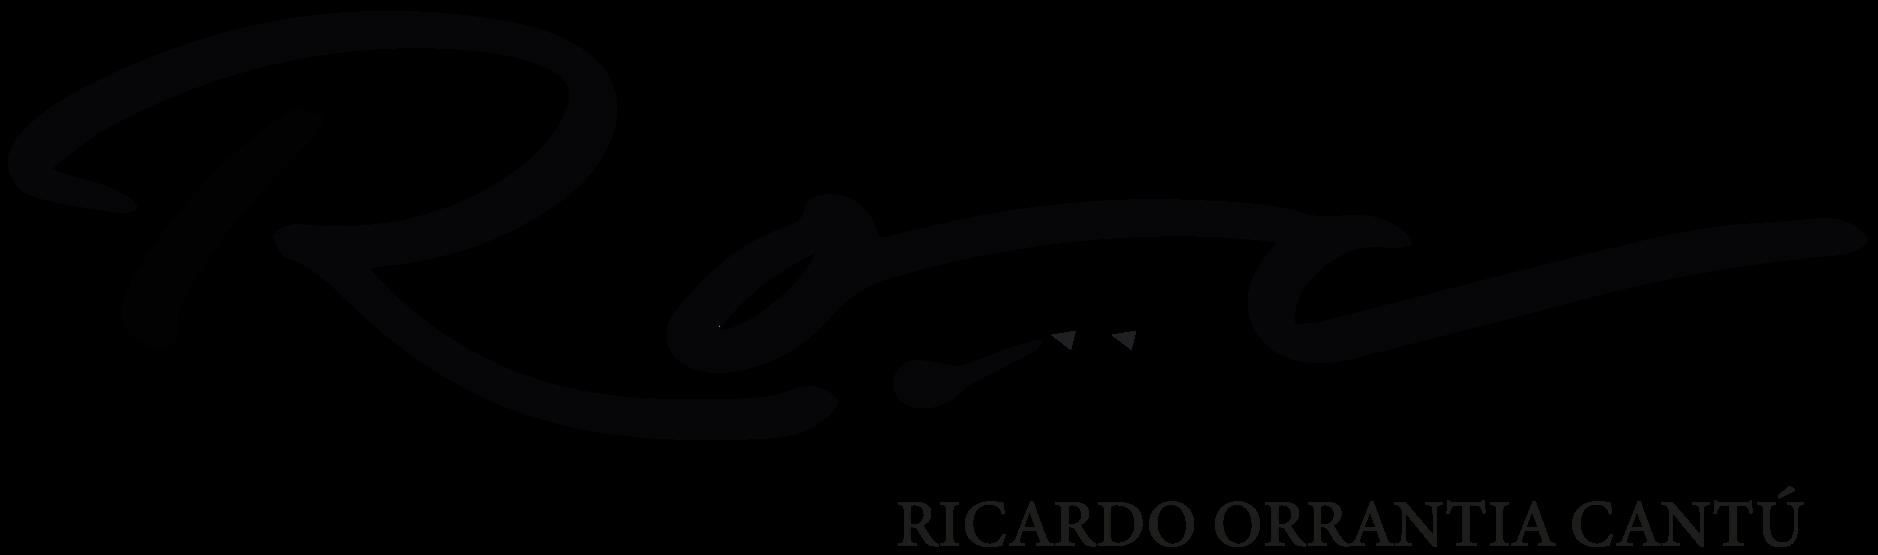 Ricardo Orrantia Cantu